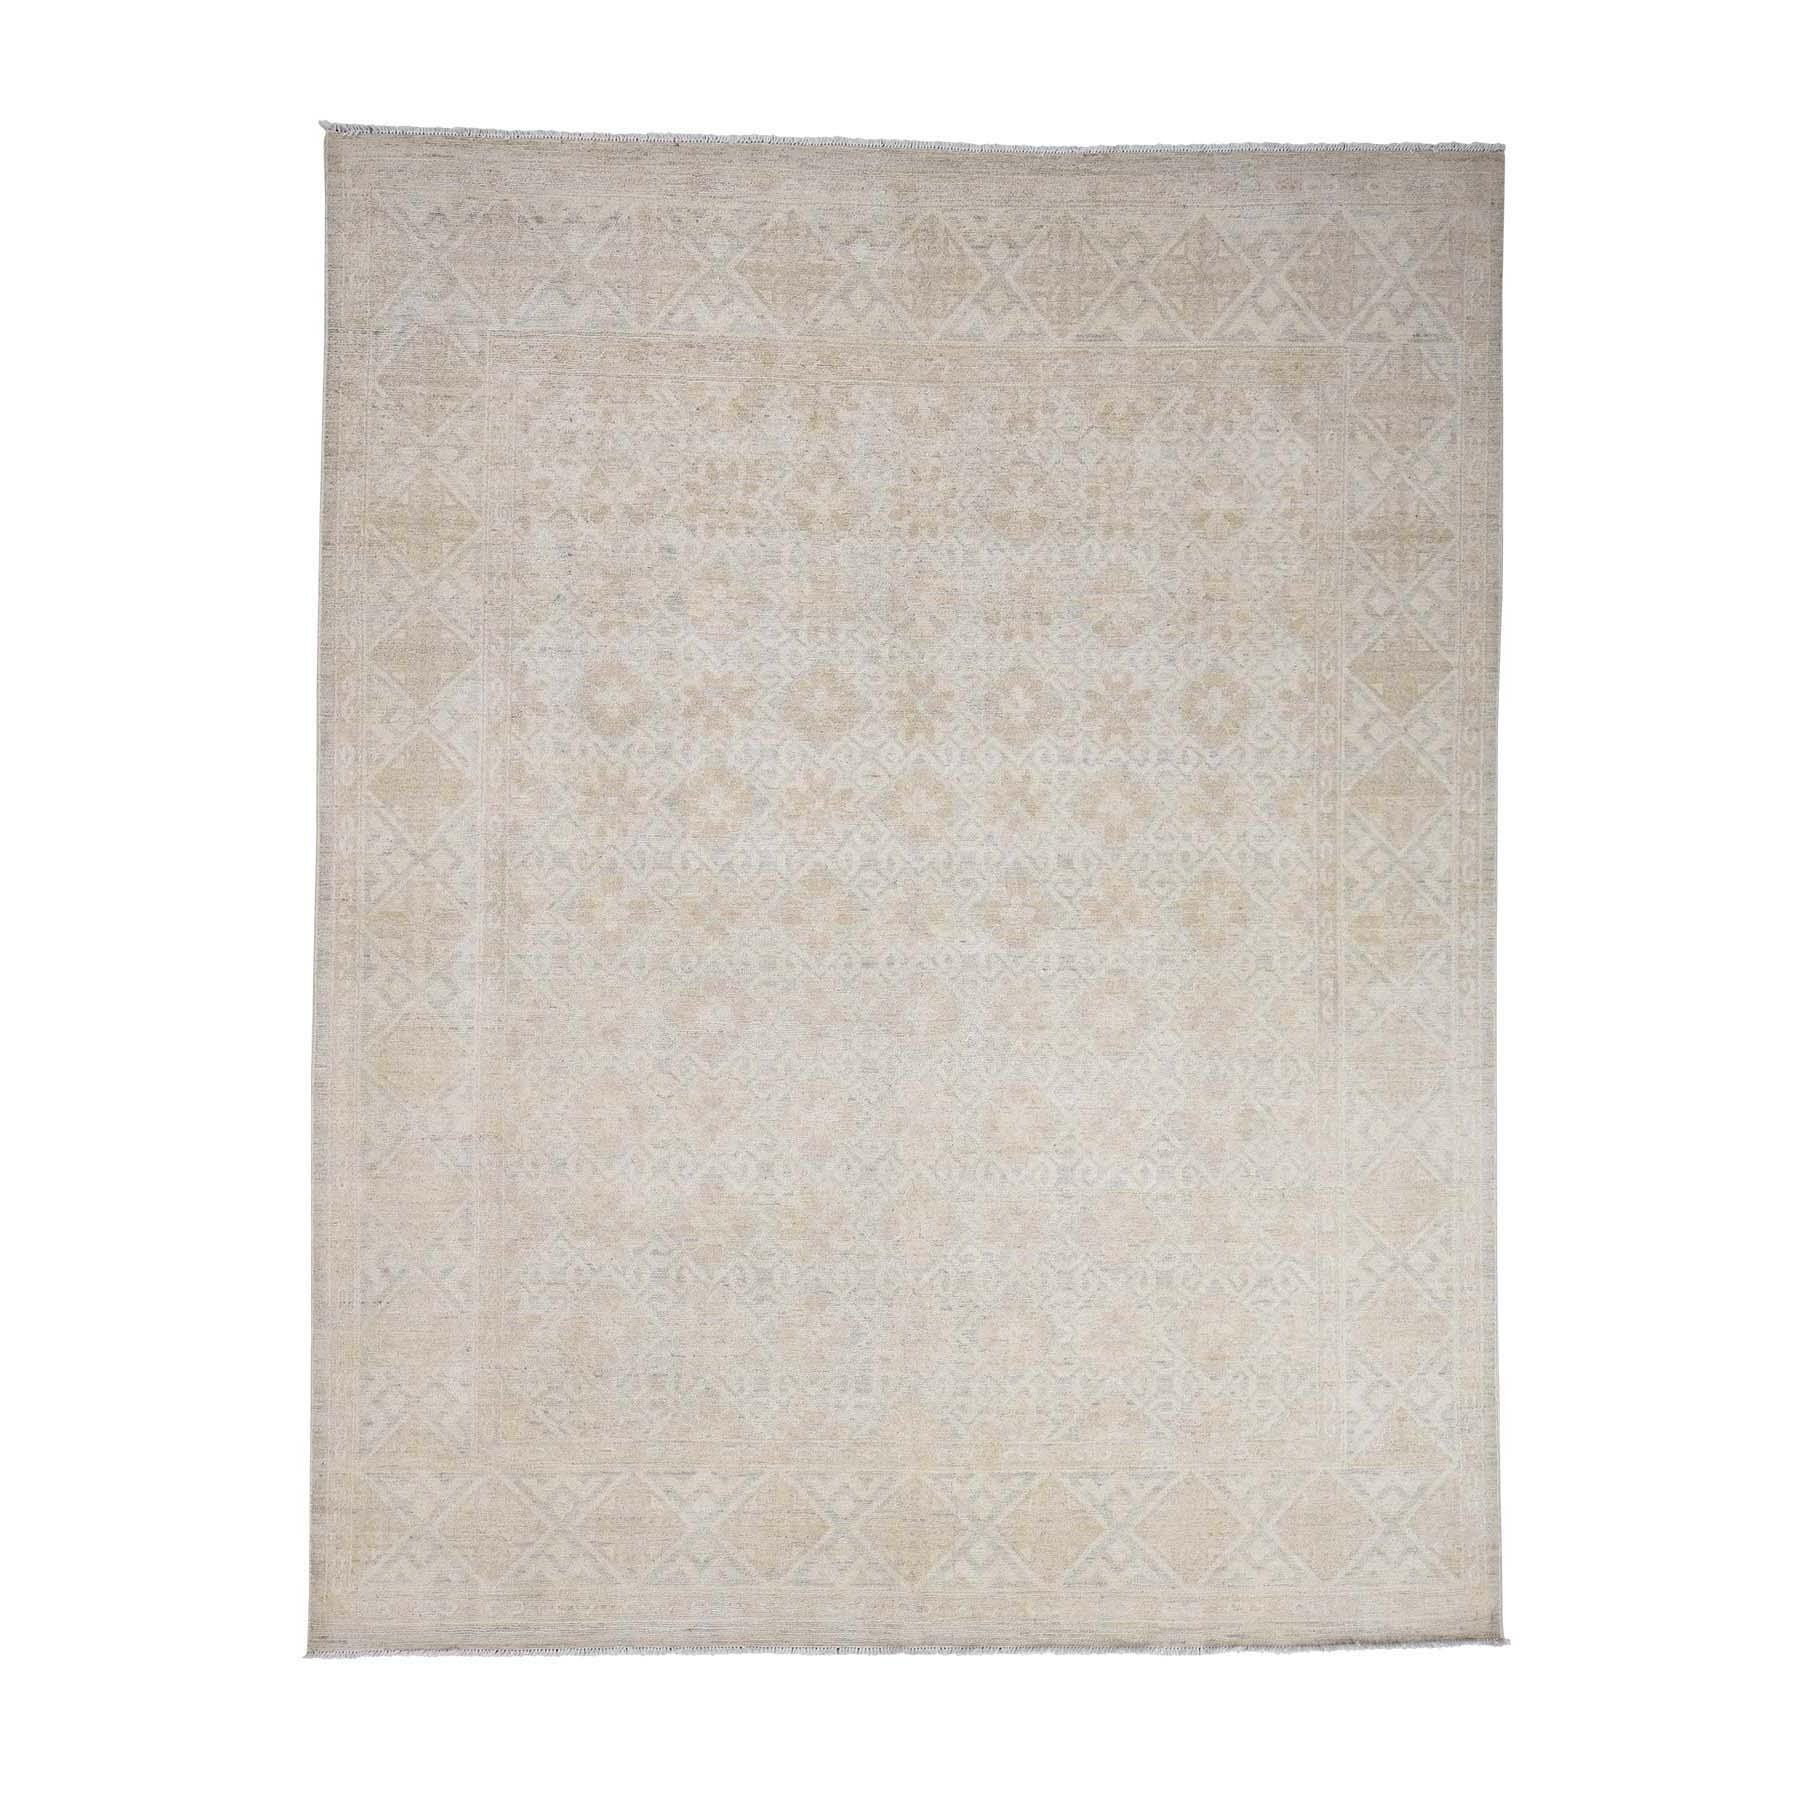 "8'X10'2"" Hand Knotted Pure Wool White Wash Khotan Oriental Rug moac9cc7"